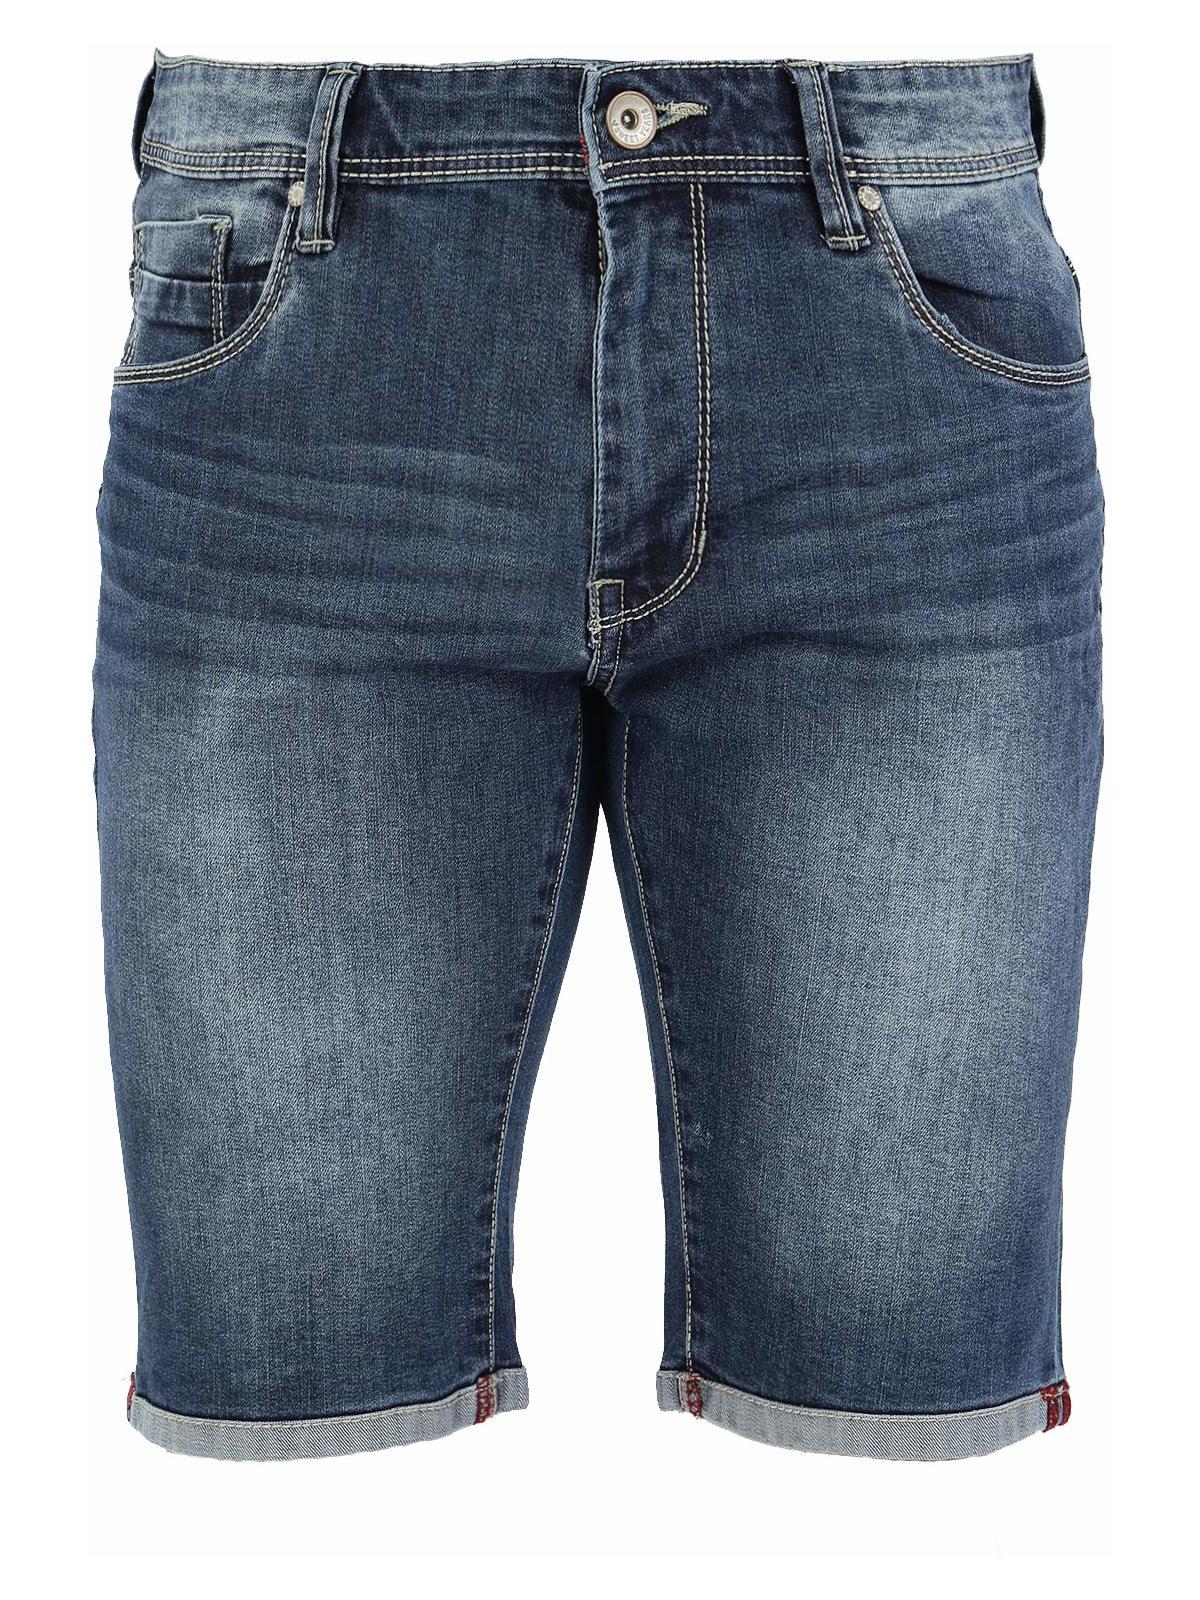 Bermuda di jeans regular fit sweet years | MecShopping